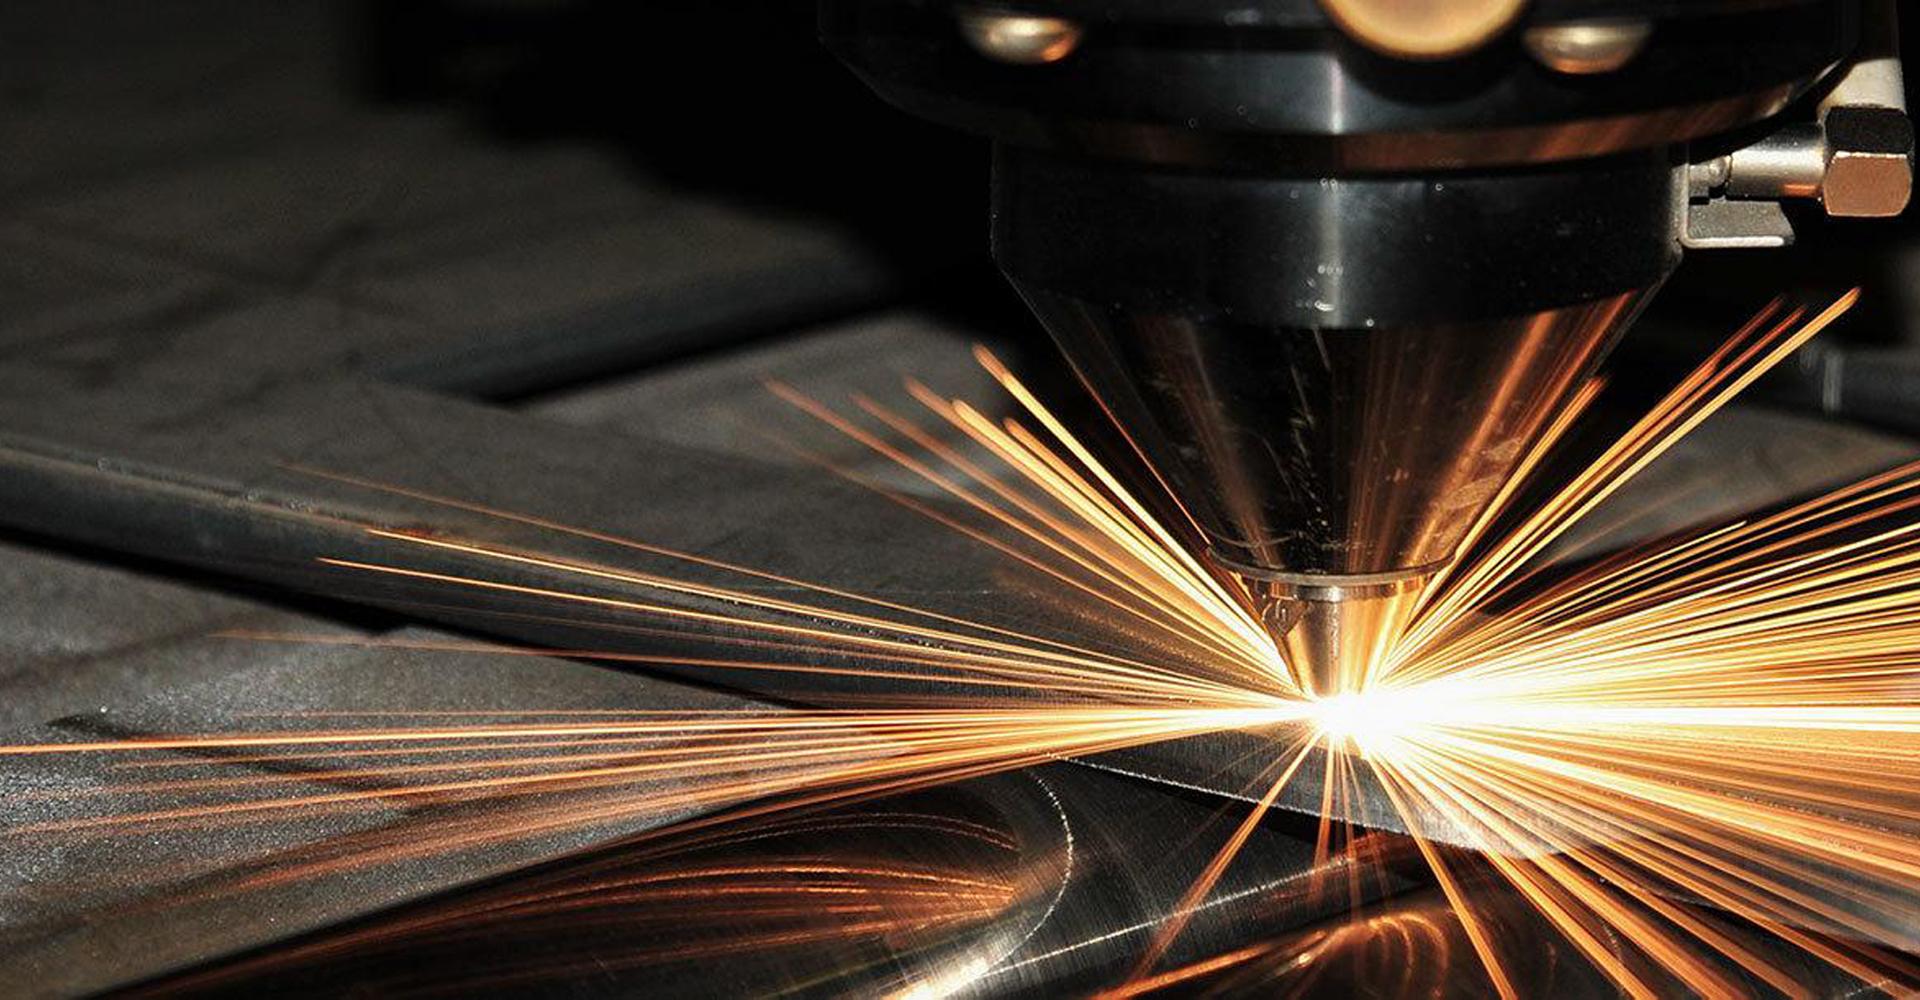 обработка металла на заказ